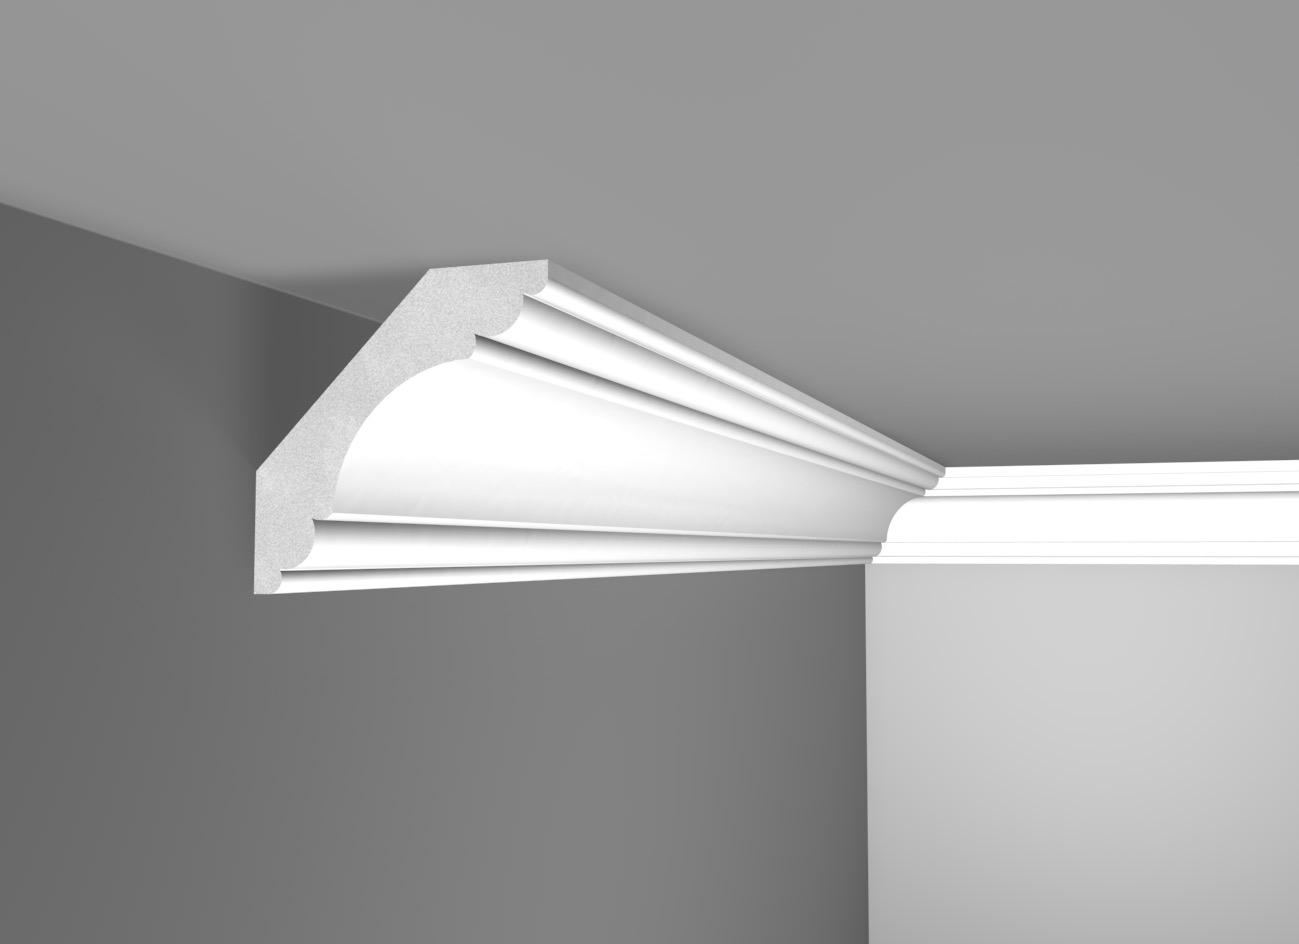 G 101 - Cornice in polistirene gessato bianco - Decorget - Ital Decori - Image 0